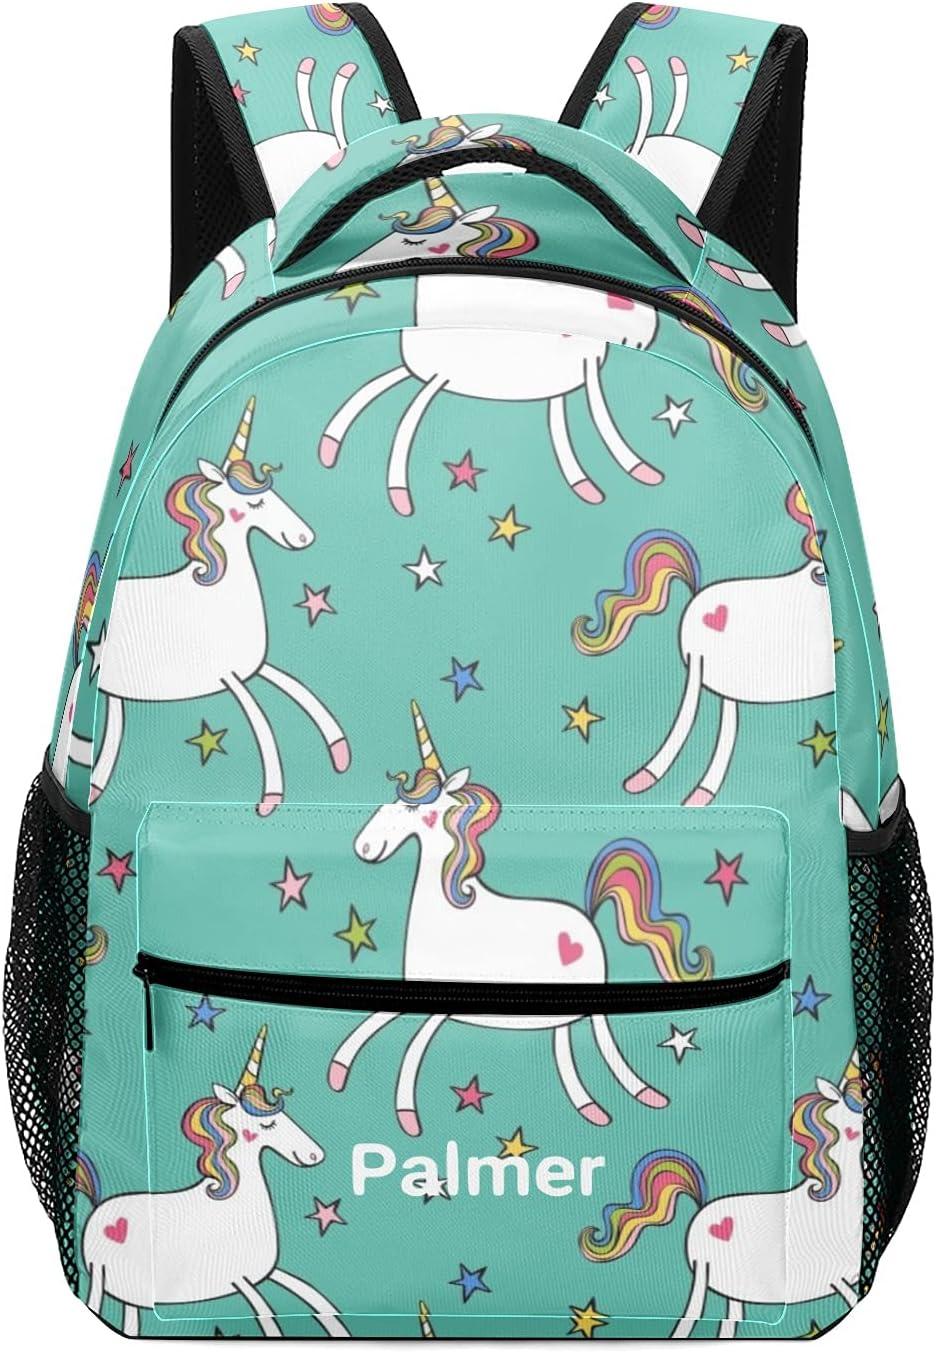 Personalized half Cartoon Unicorn Schoolbag Ranking TOP5 Waterproof Backpack Daypa